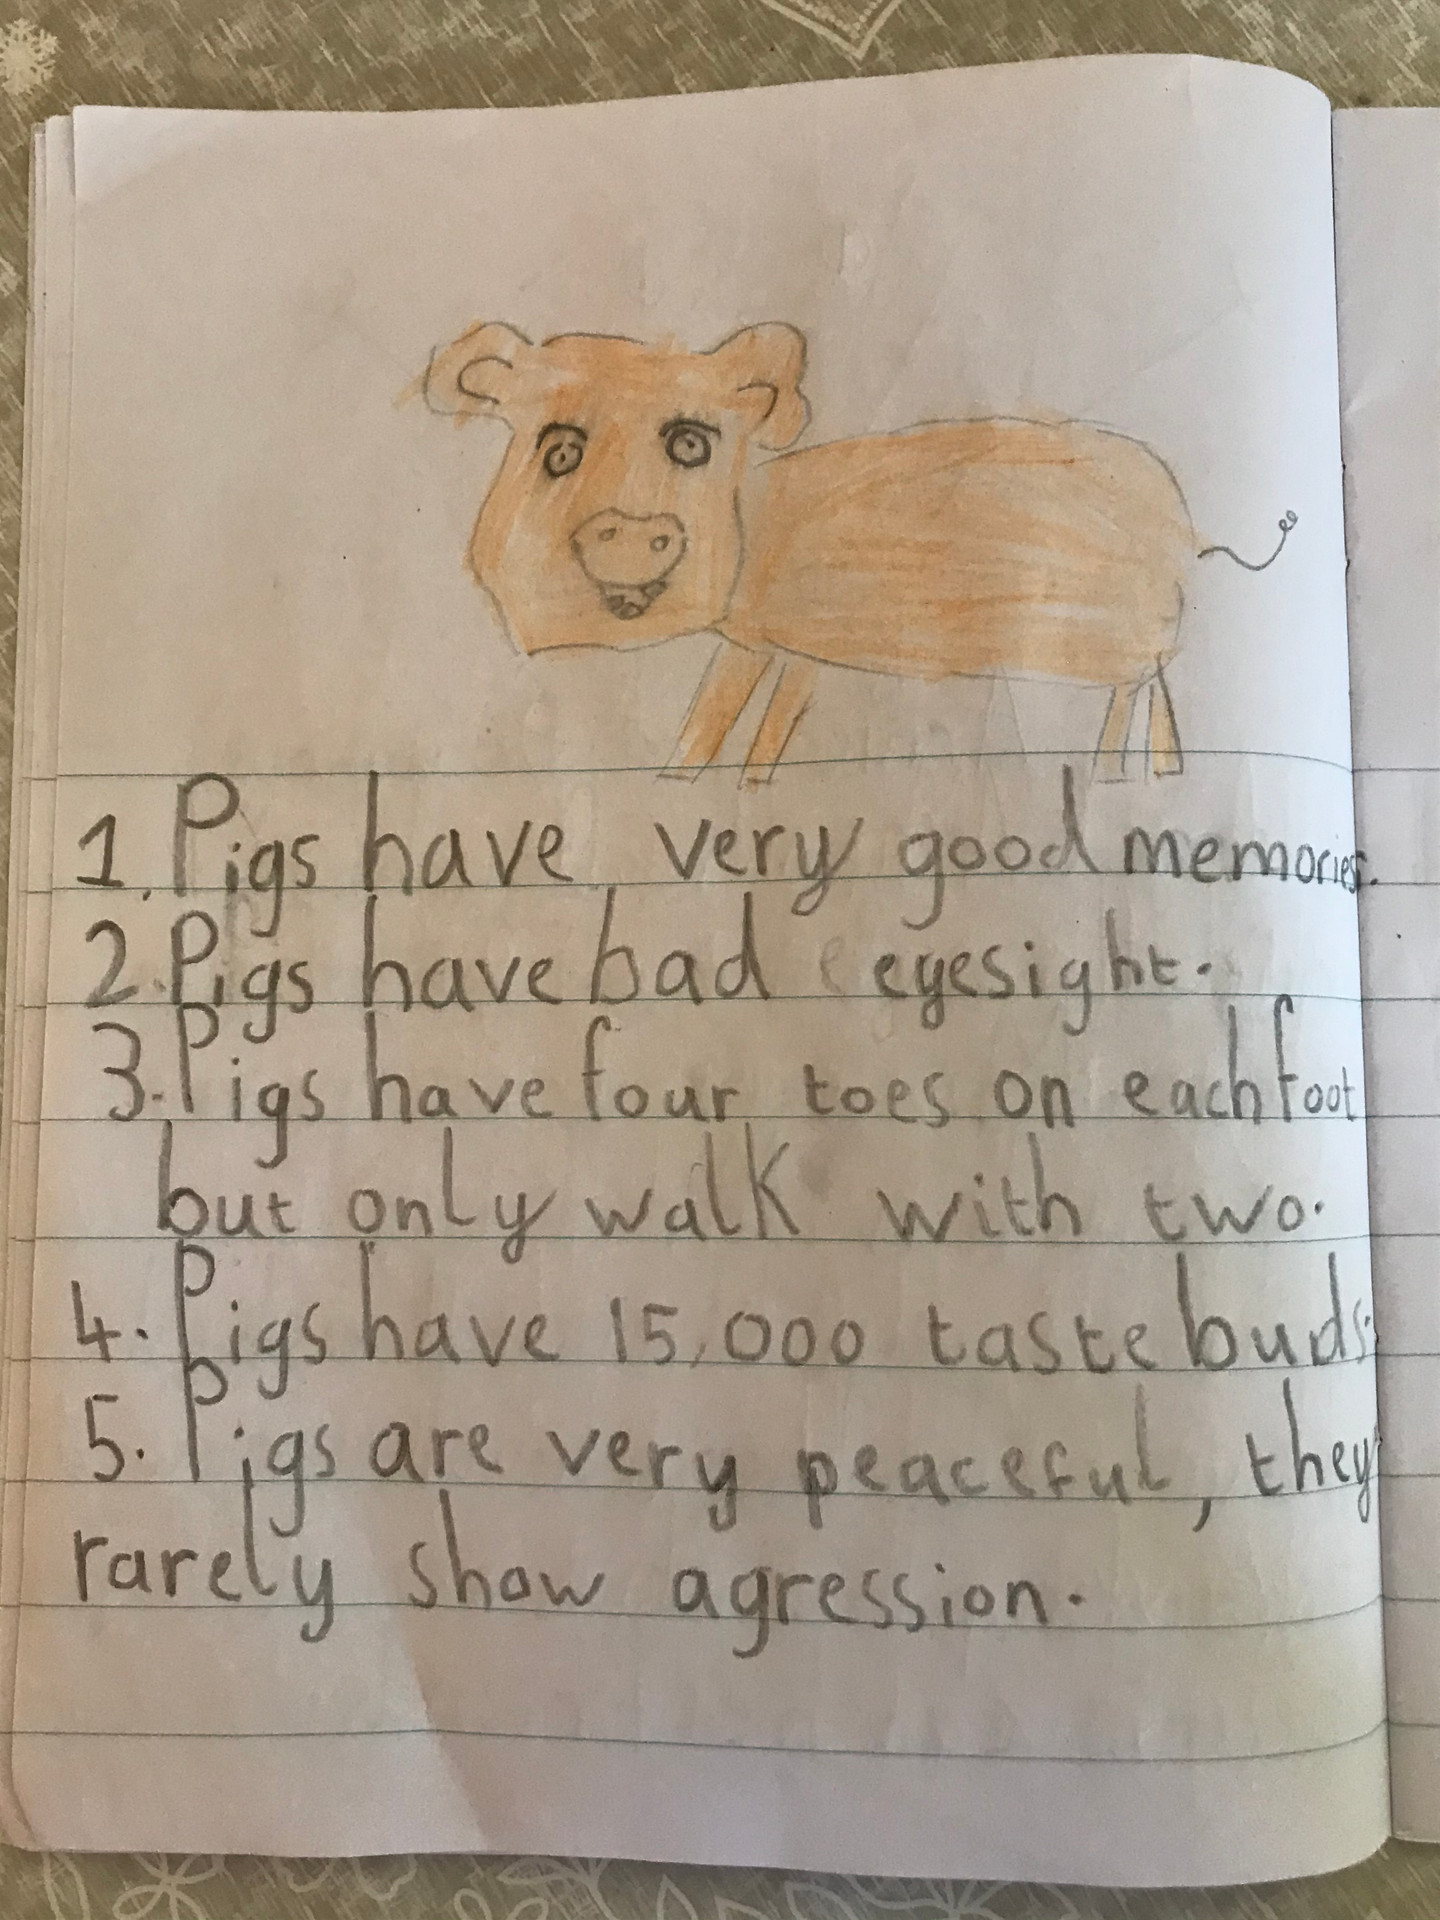 Darragh's animal facts